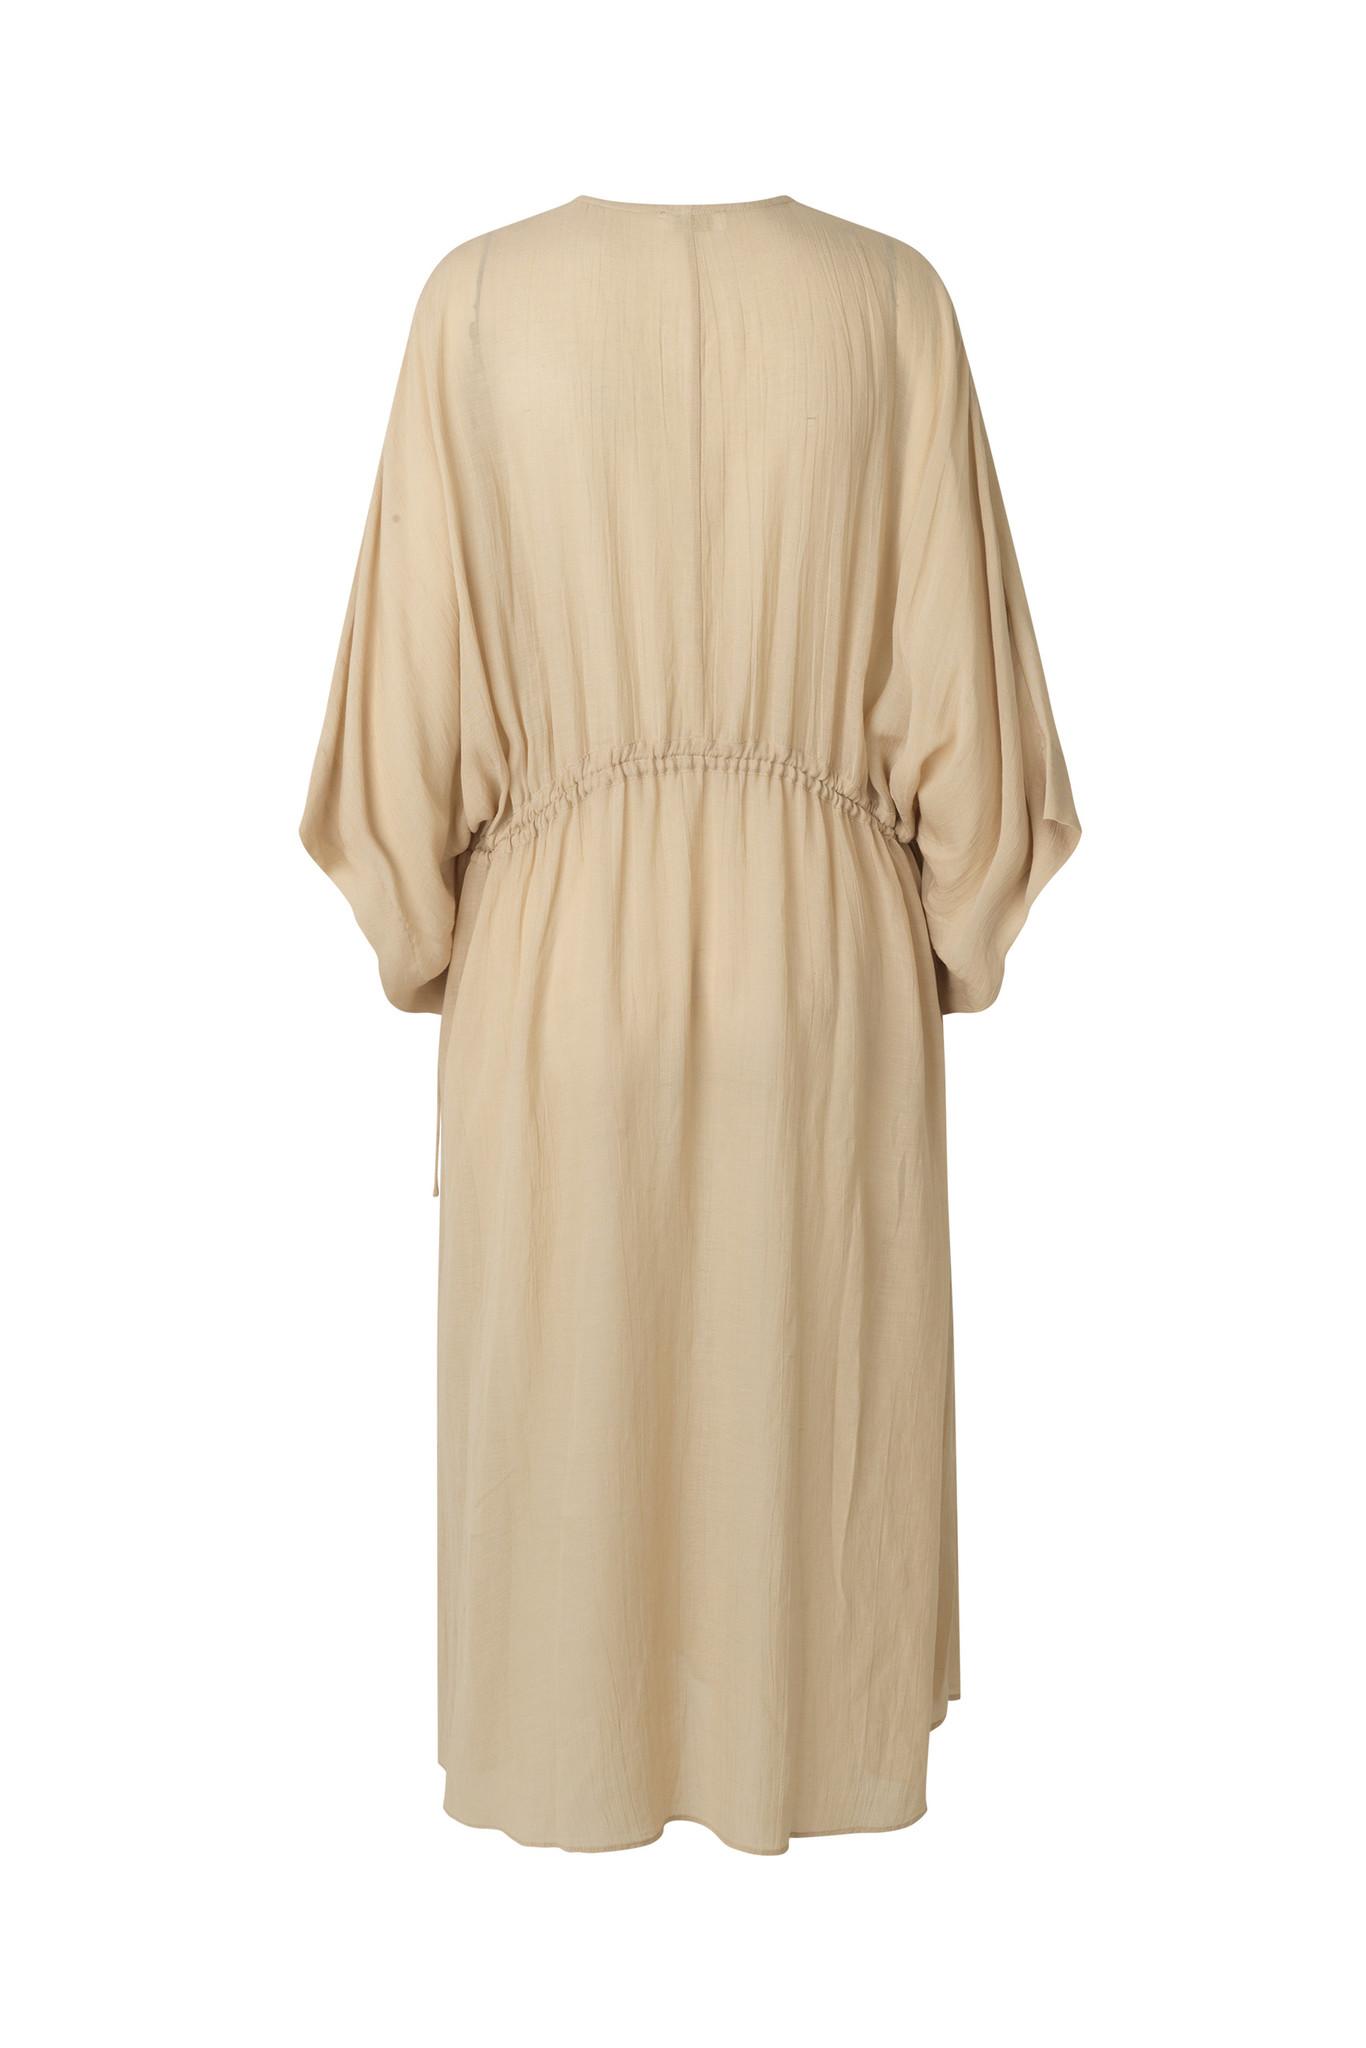 Tamia Dress - Beige-5